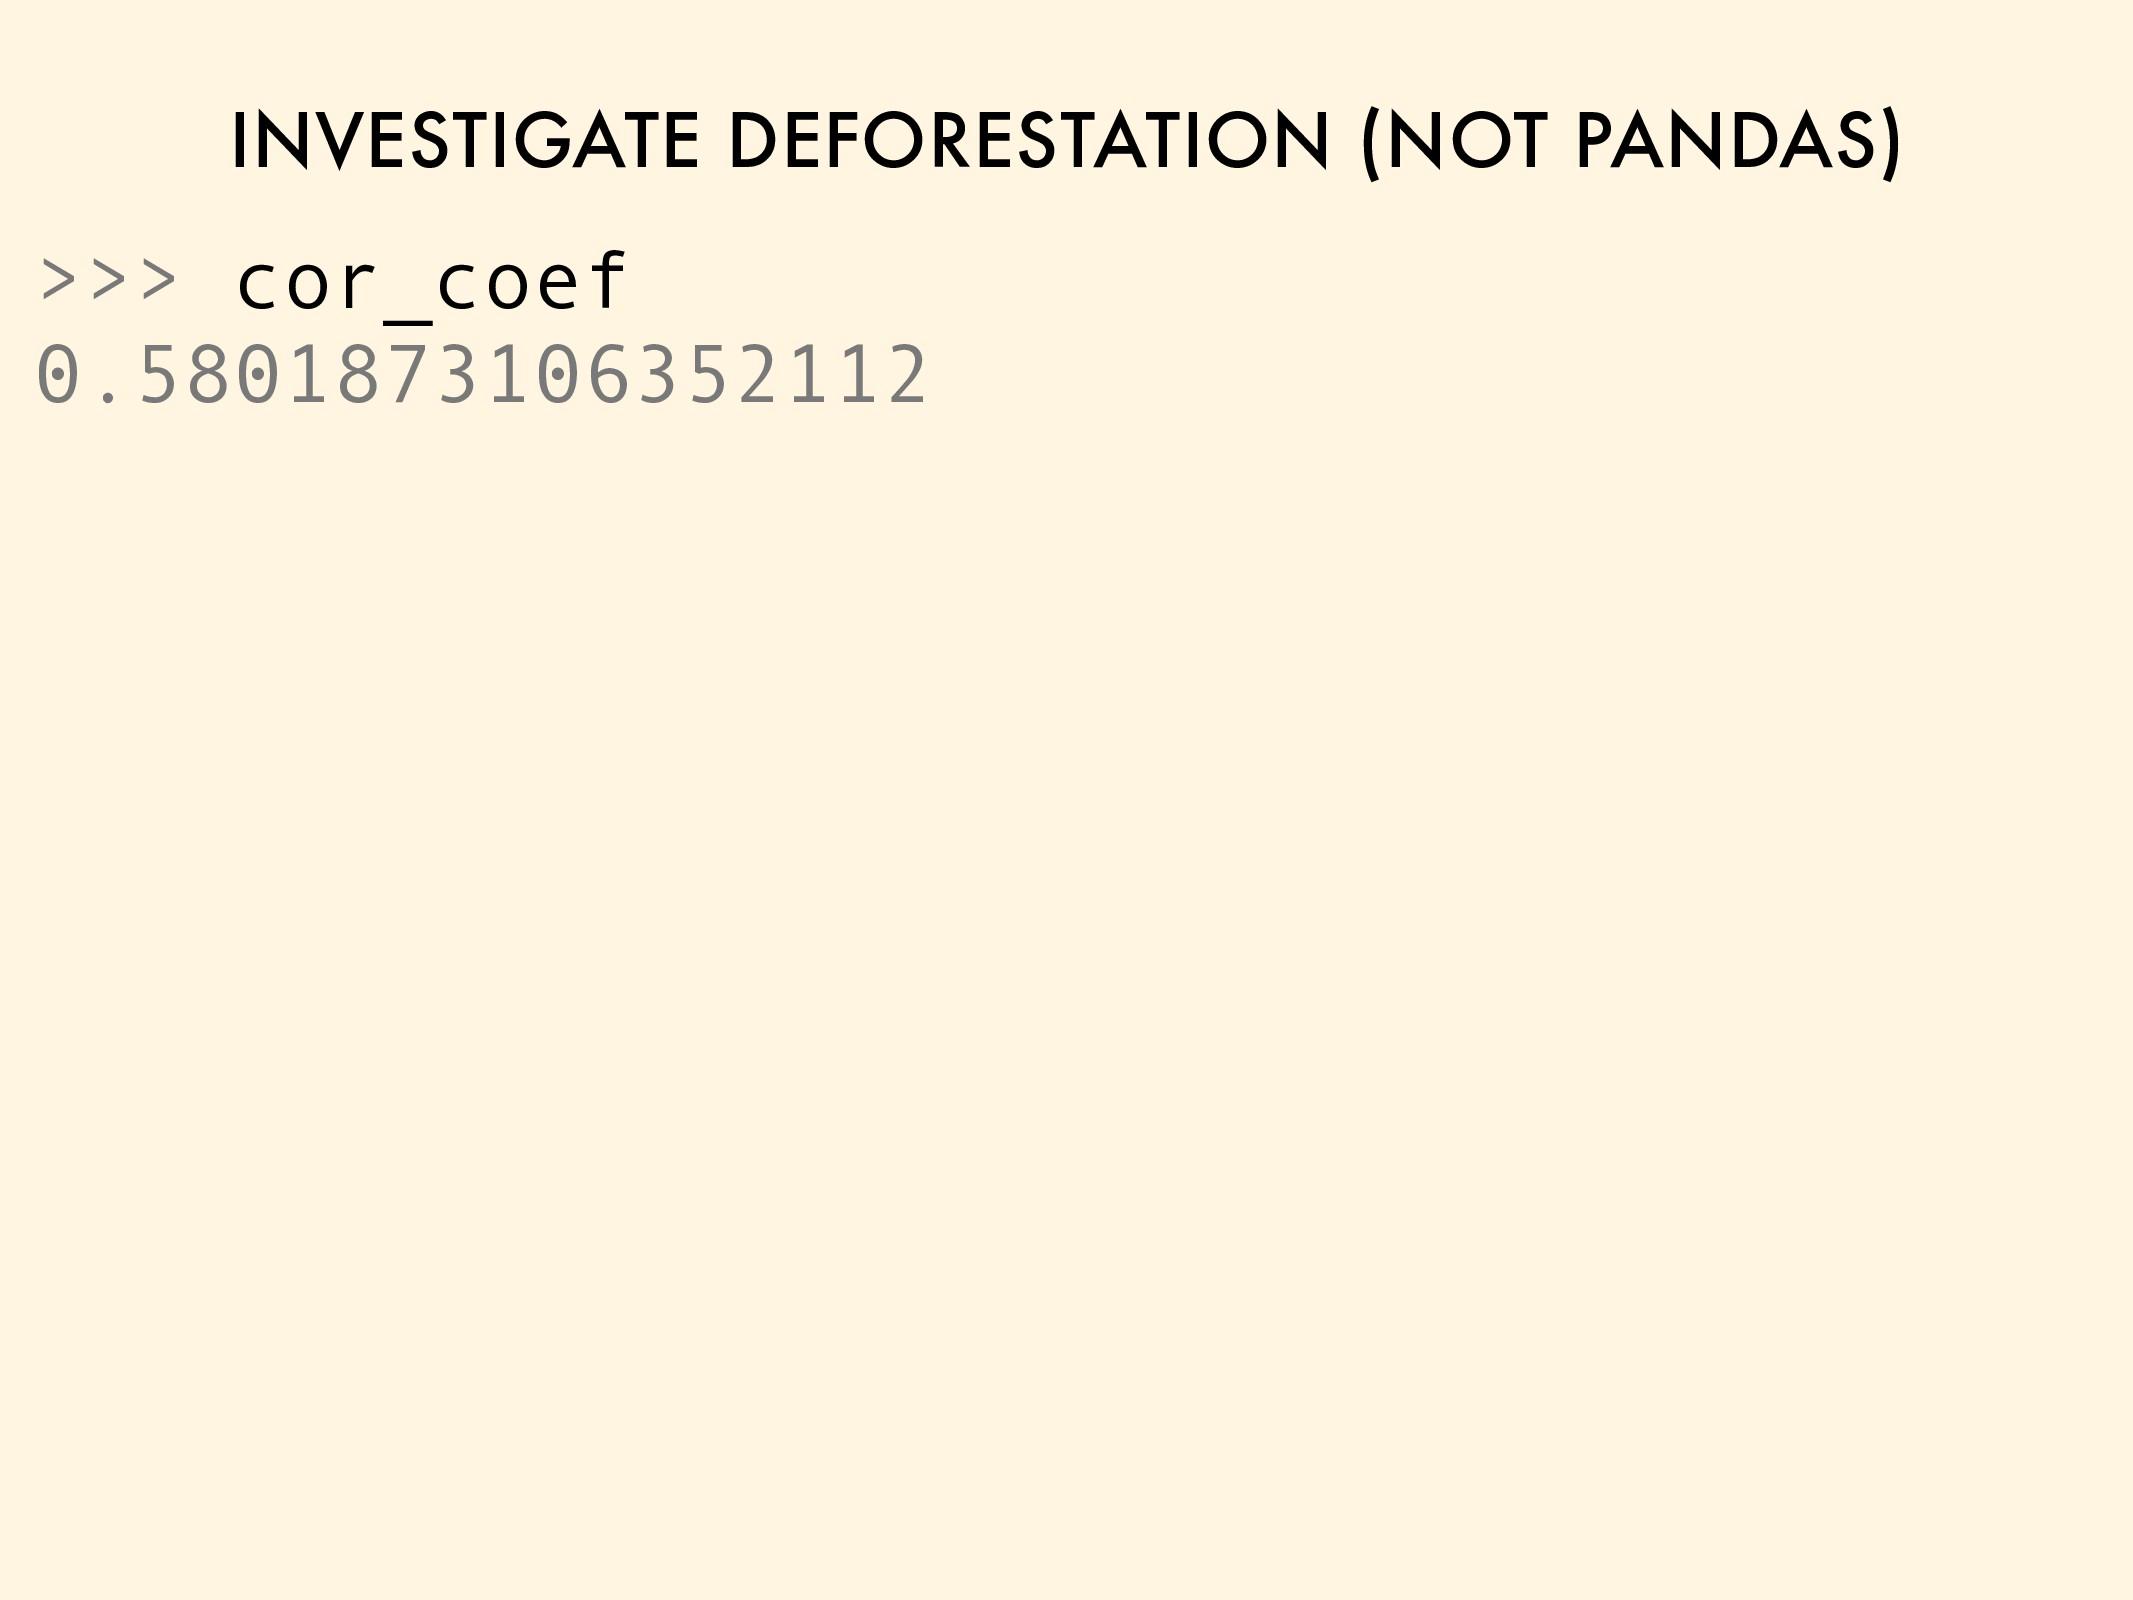 INVESTIGATE DEFORESTATION (NOT PANDAS) >>> cor_...